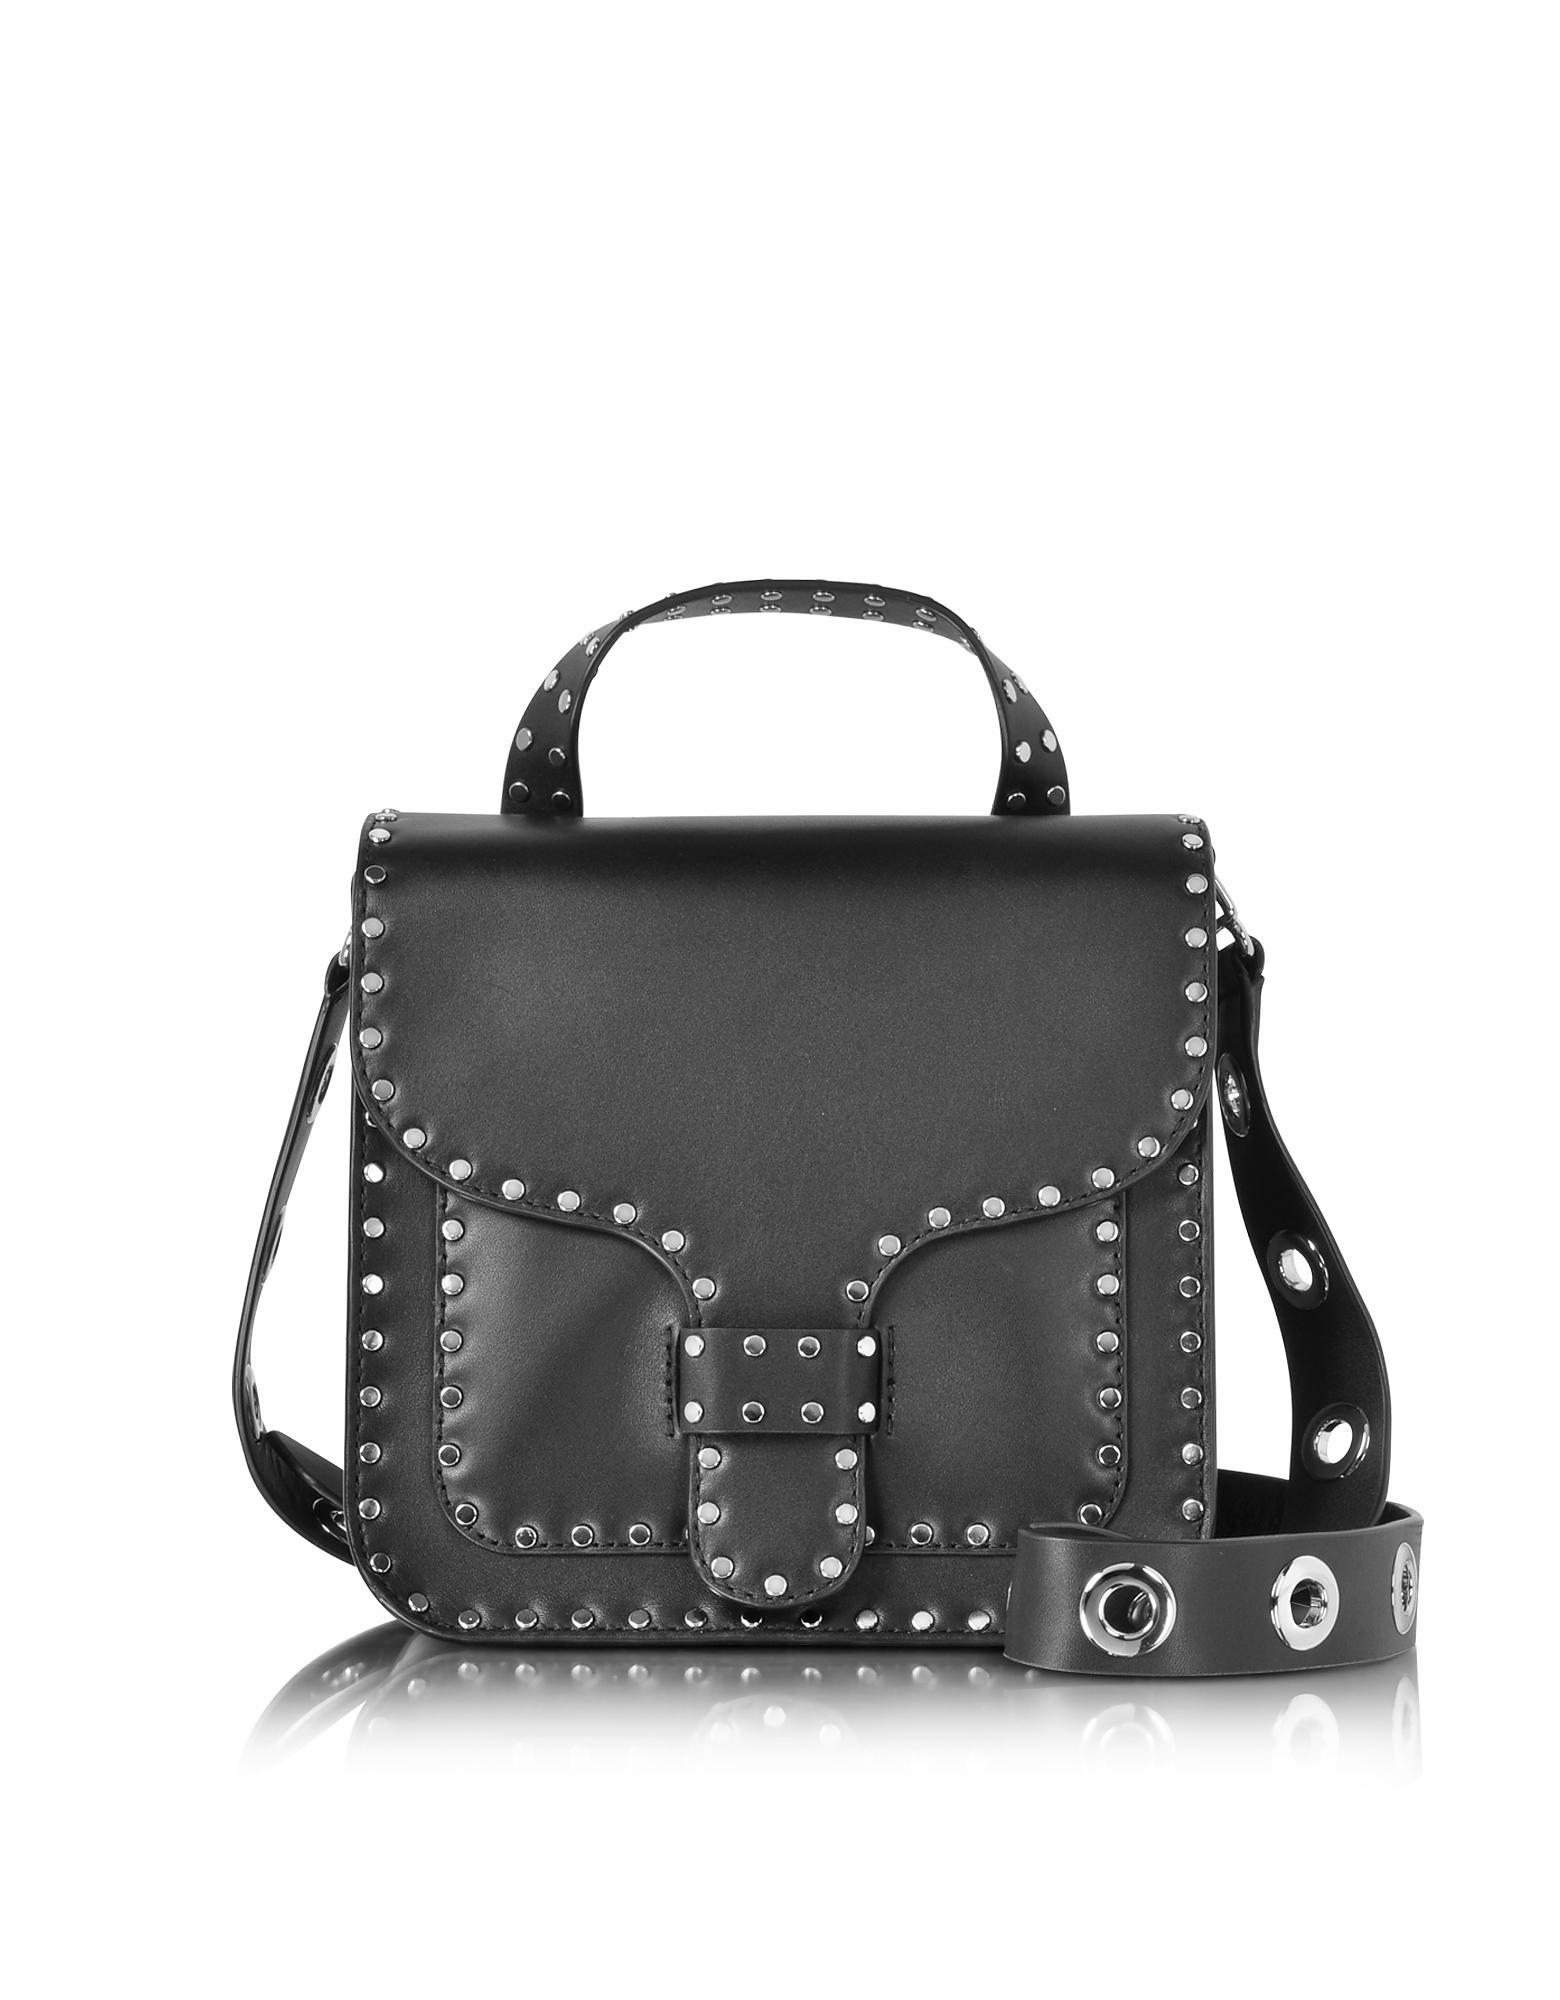 Rebecca Minkoff Black Studded Leather Midnighter Top